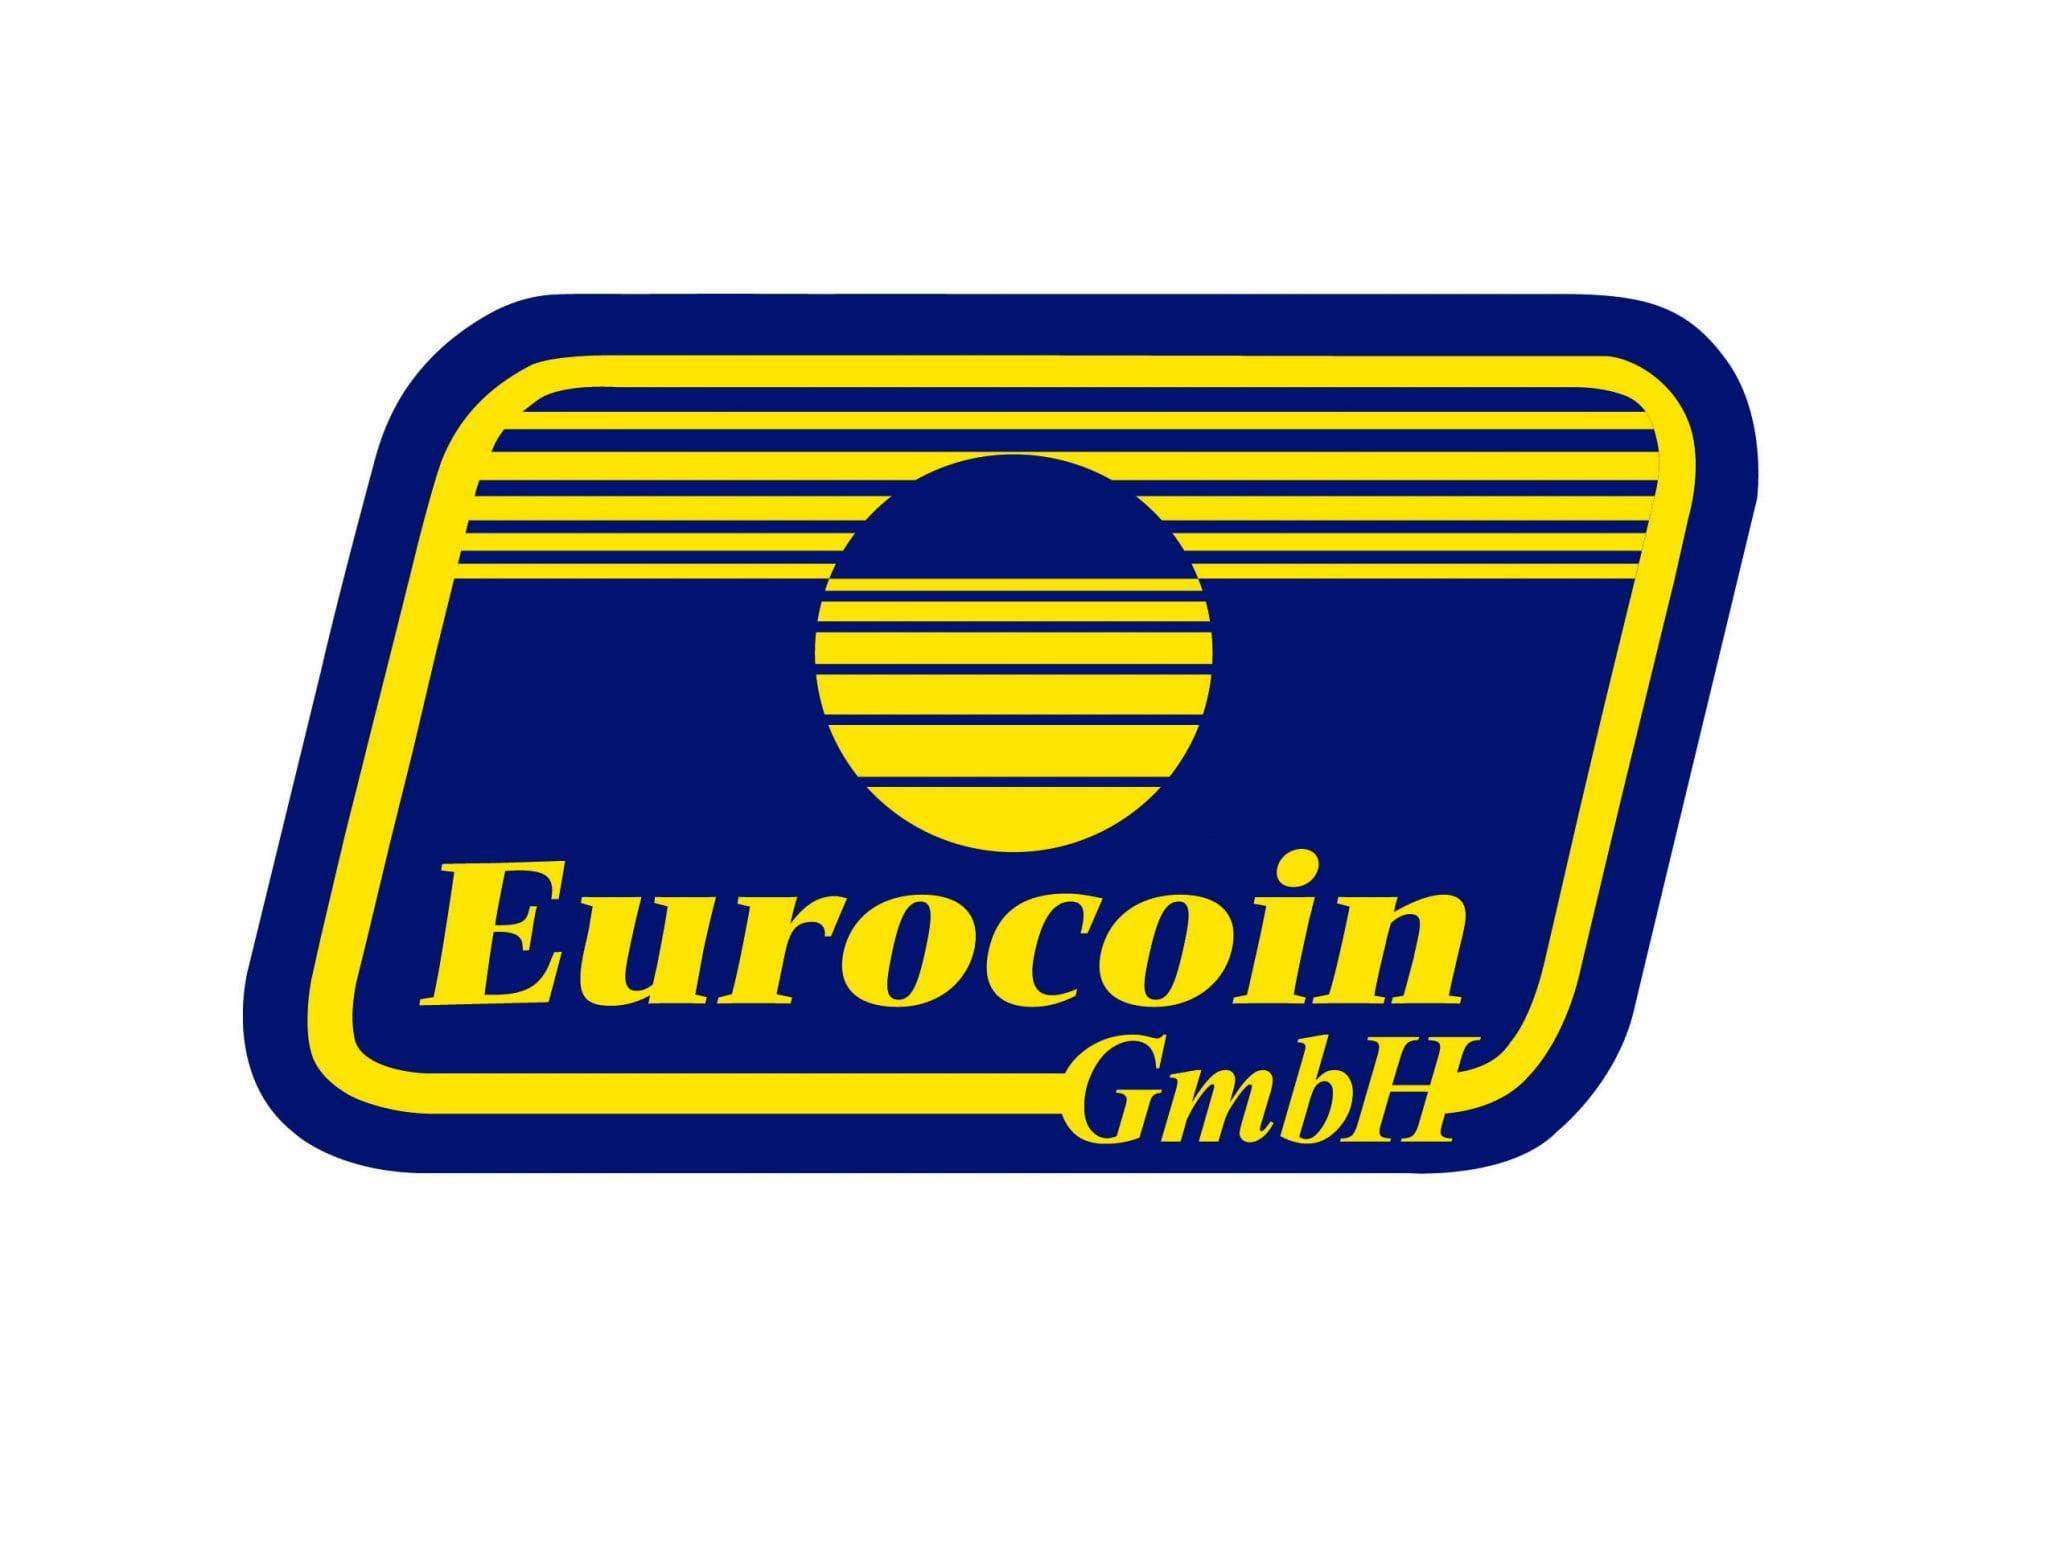 Eurocoin GmbH